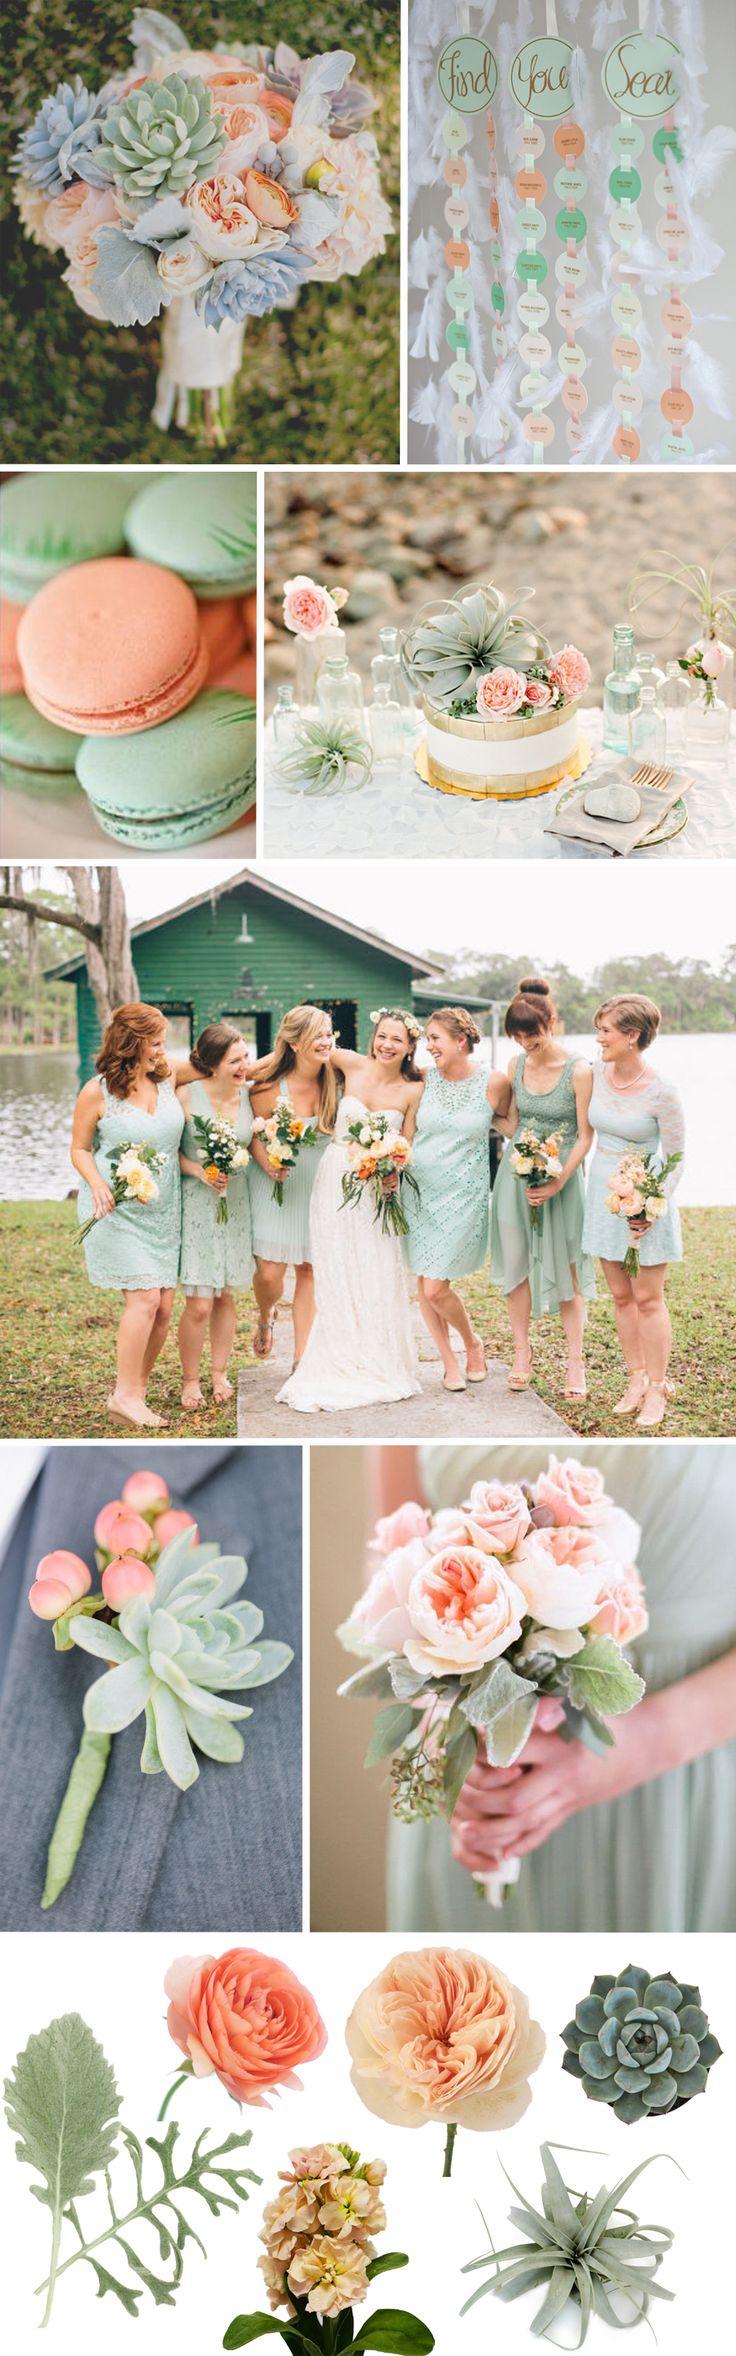 14+ Sage green wedding colors ideas